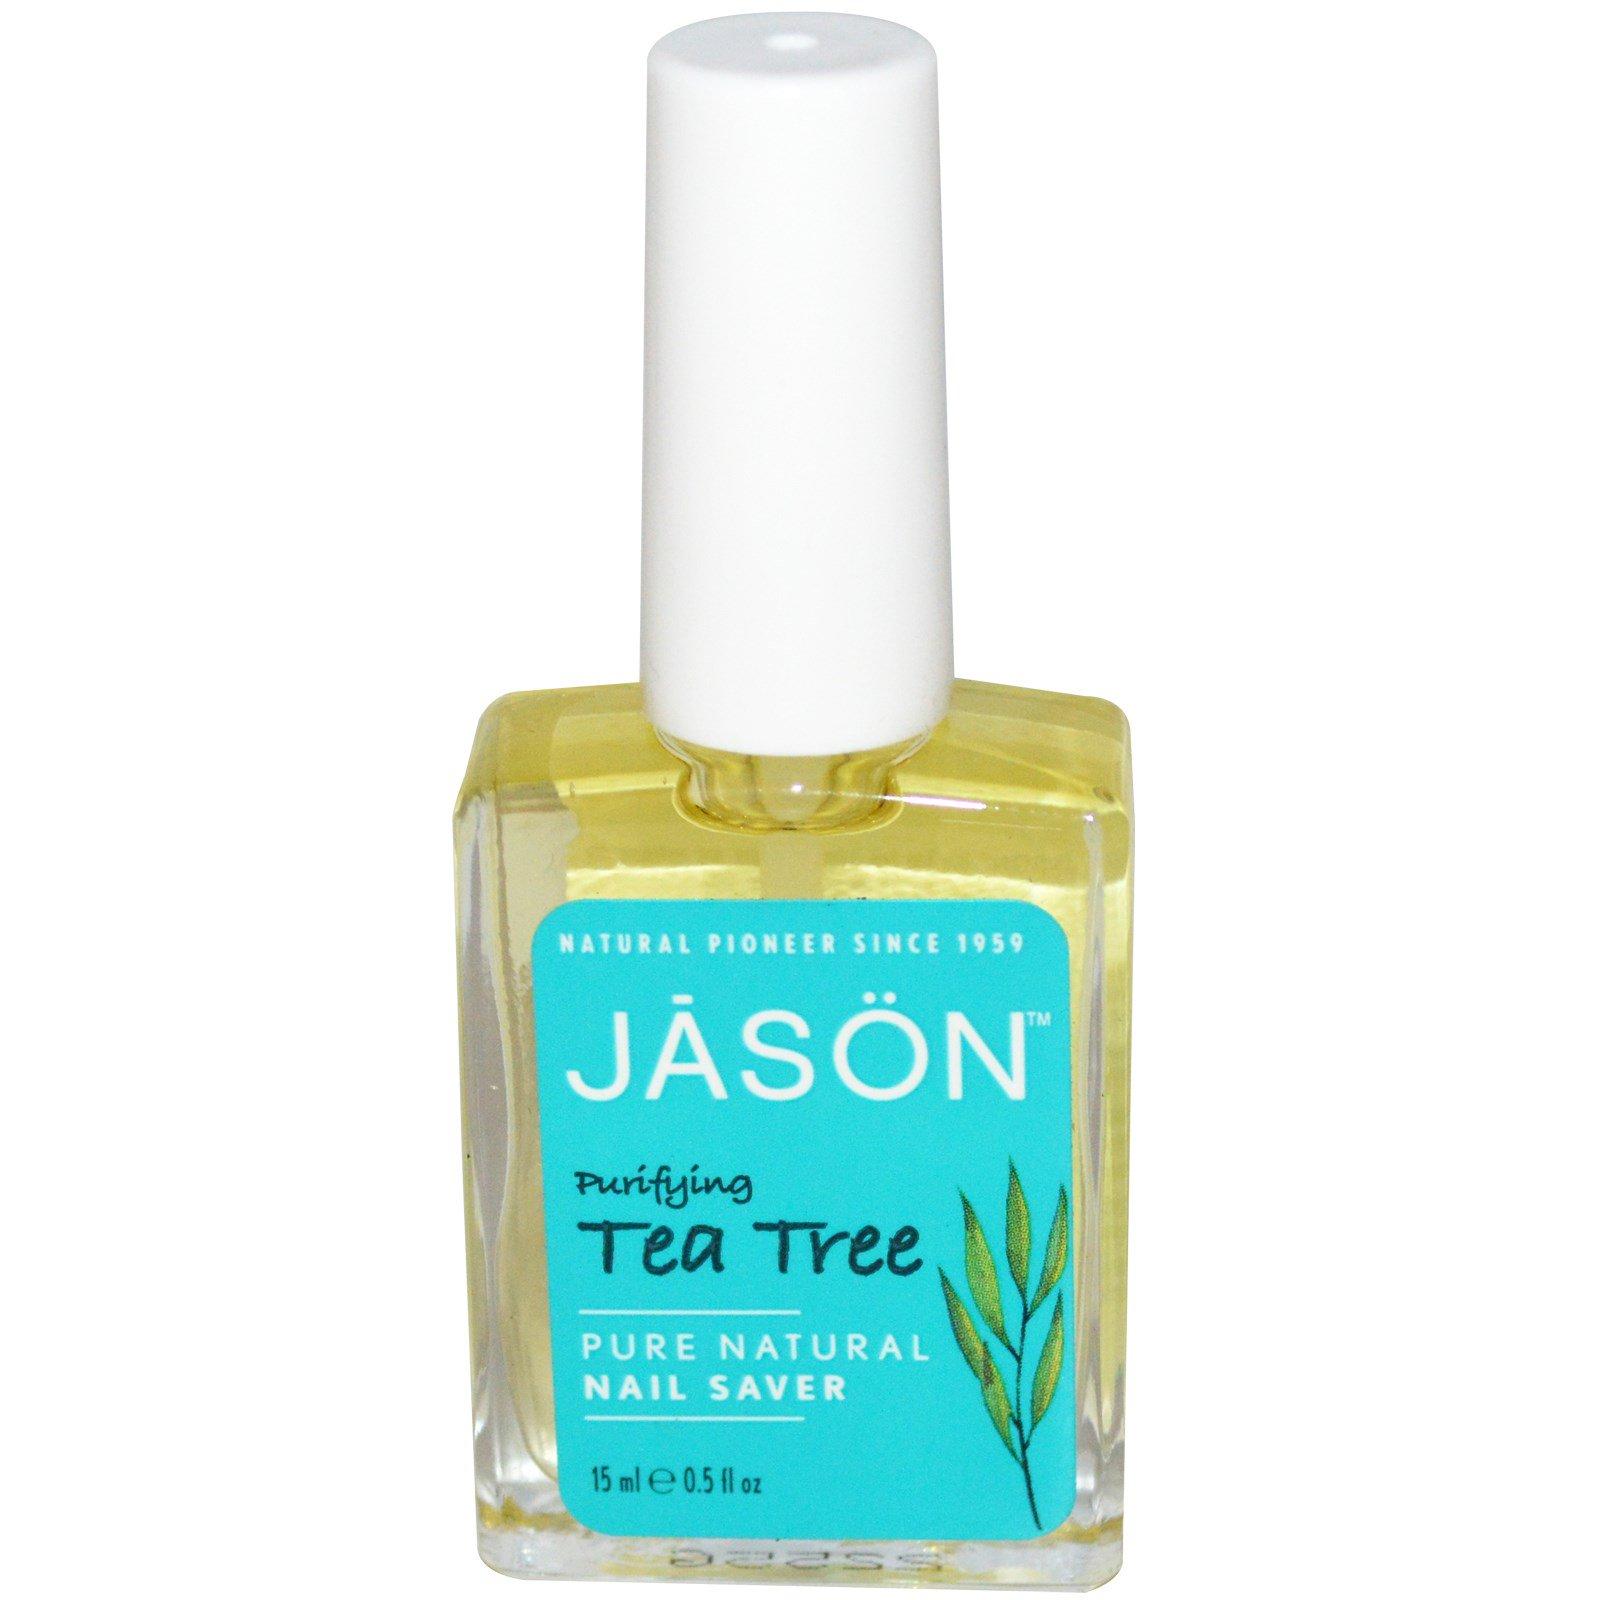 Jason Natural, Nail Saver, Tea Tree, 0.5 fl oz (15 ml) - iHerb.com